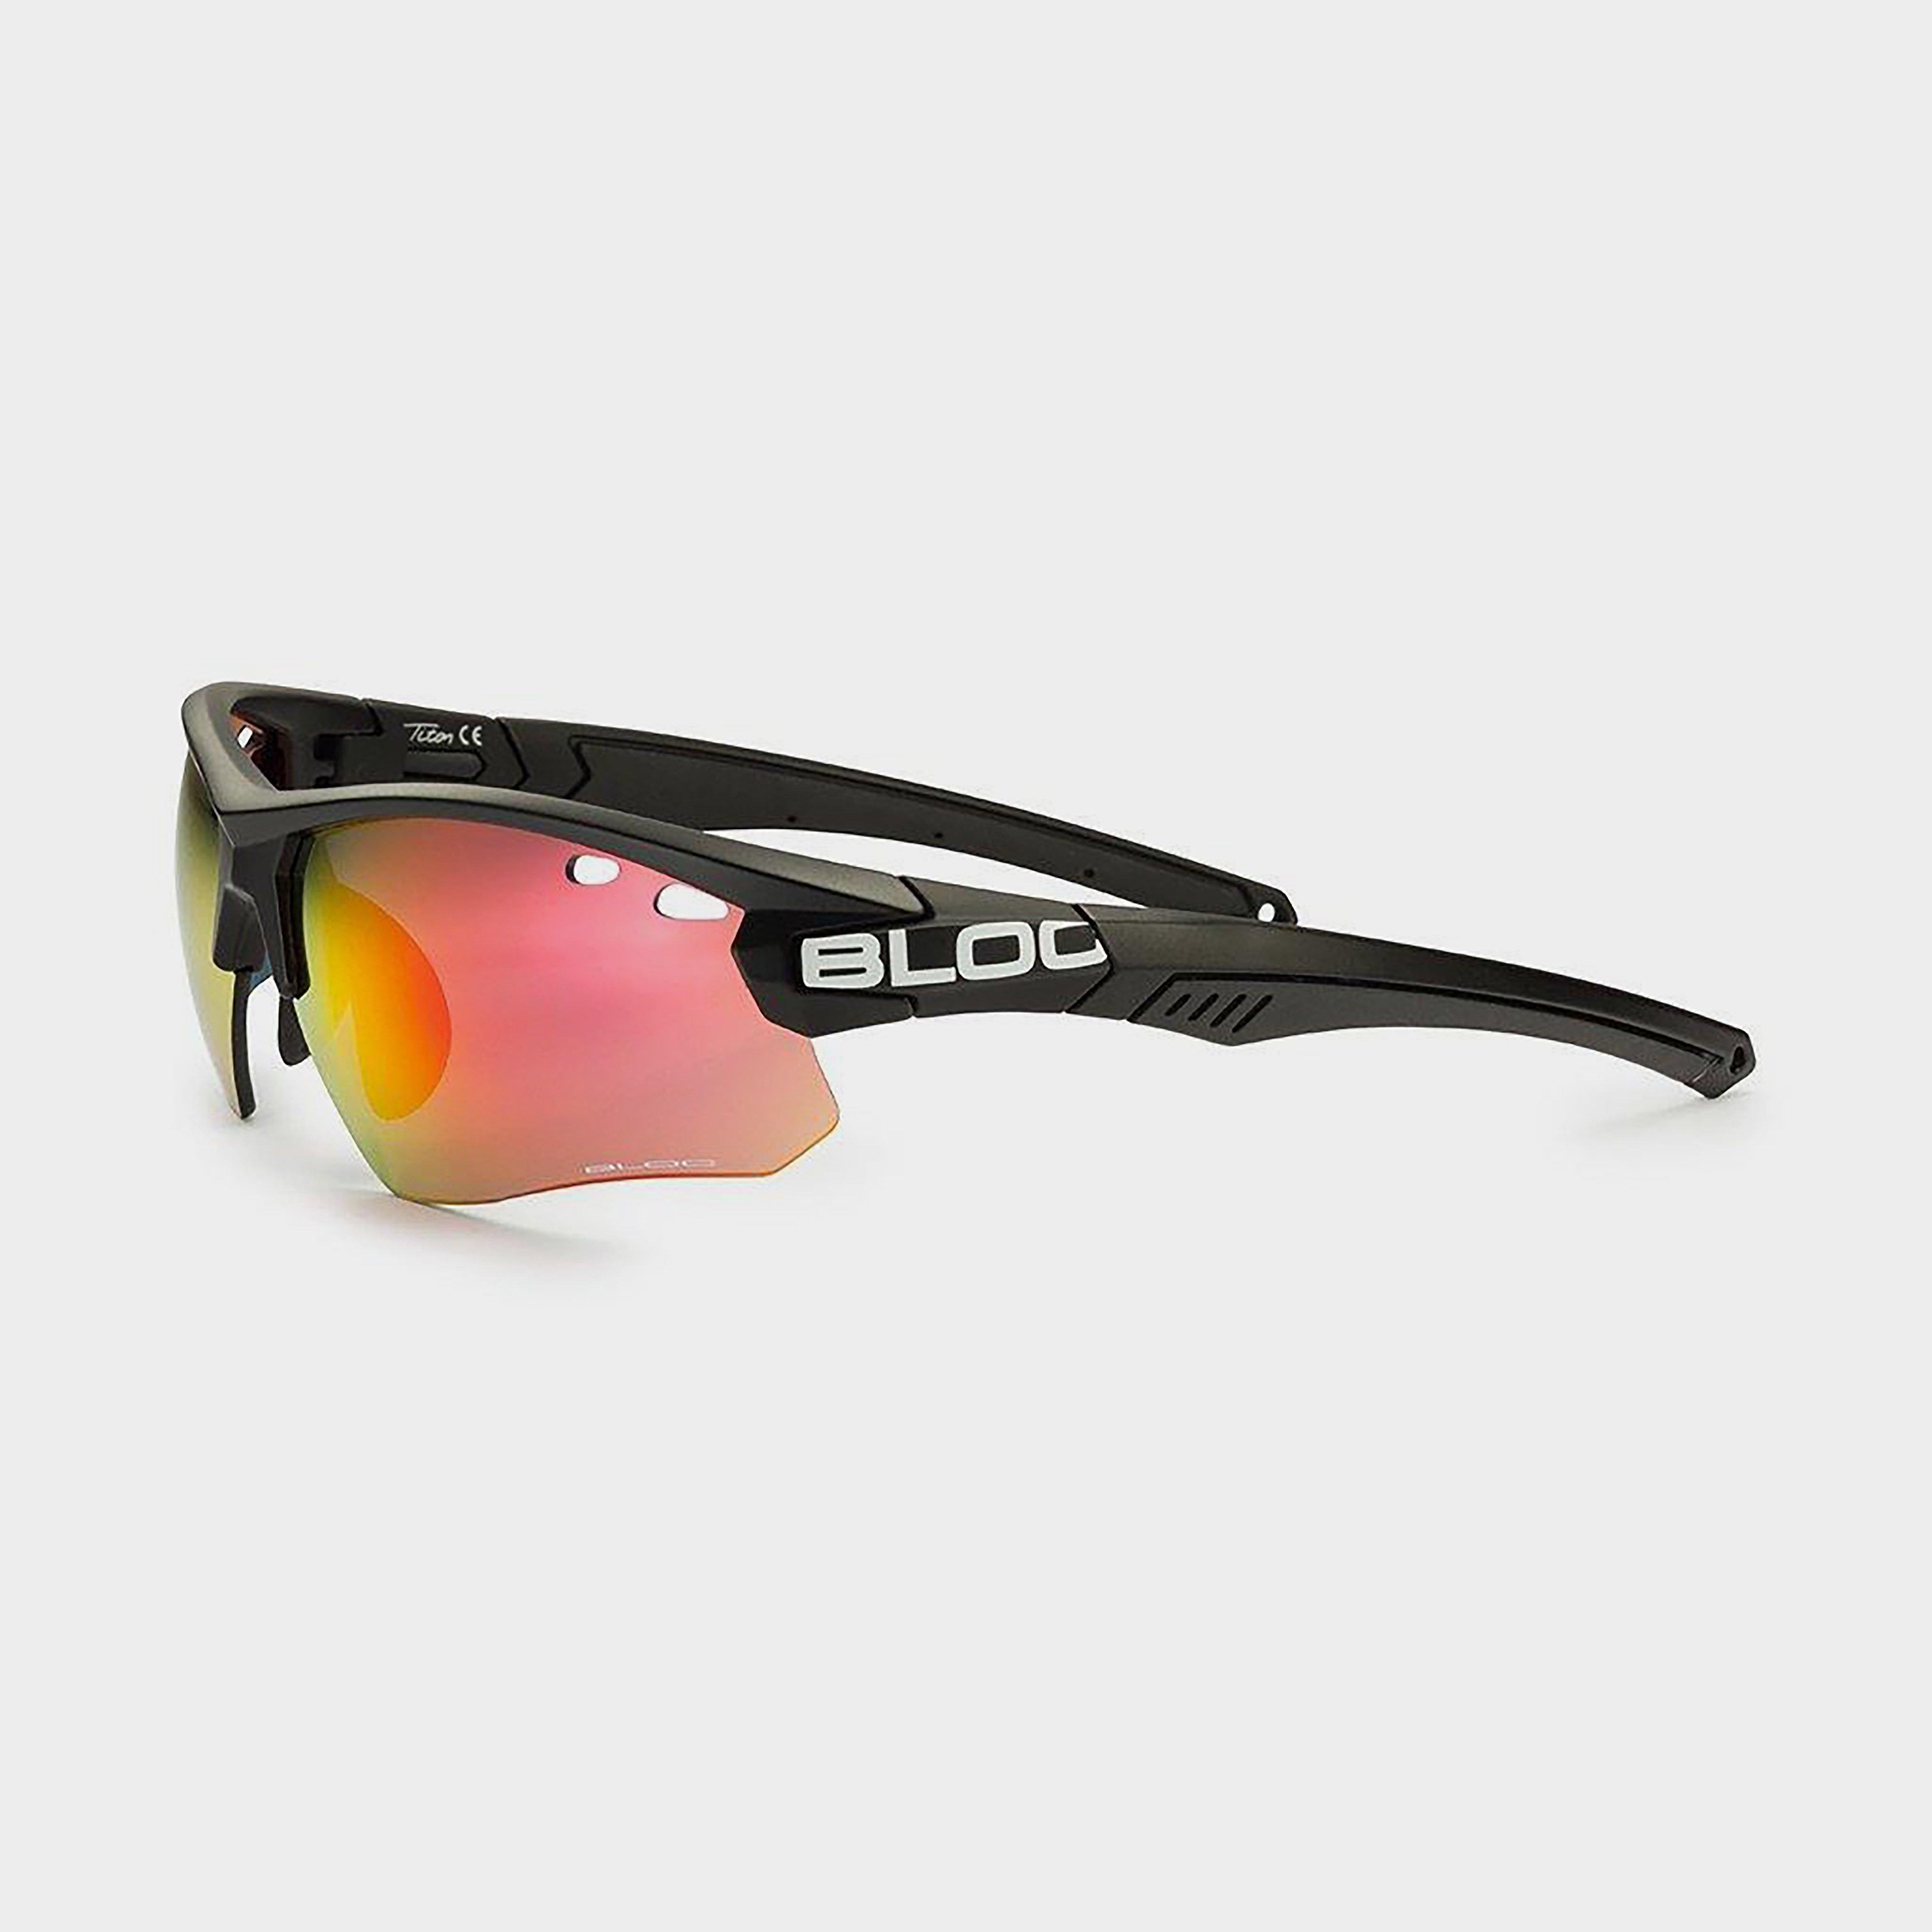 Bloc Bloc Titan XR630 Sunglasses - Black, Black